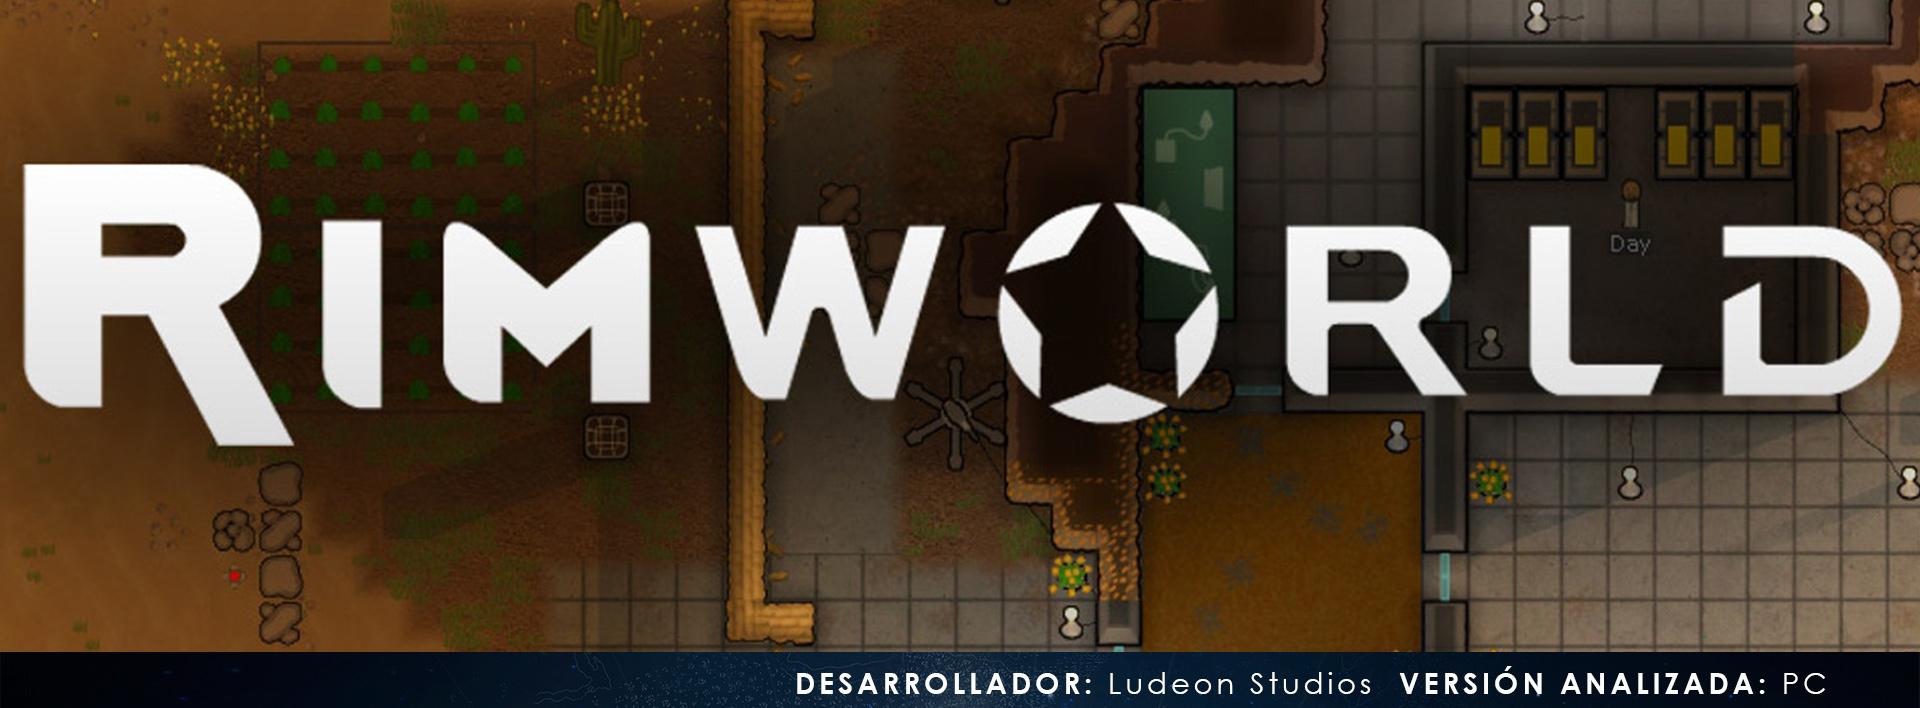 Rimworld cabecera